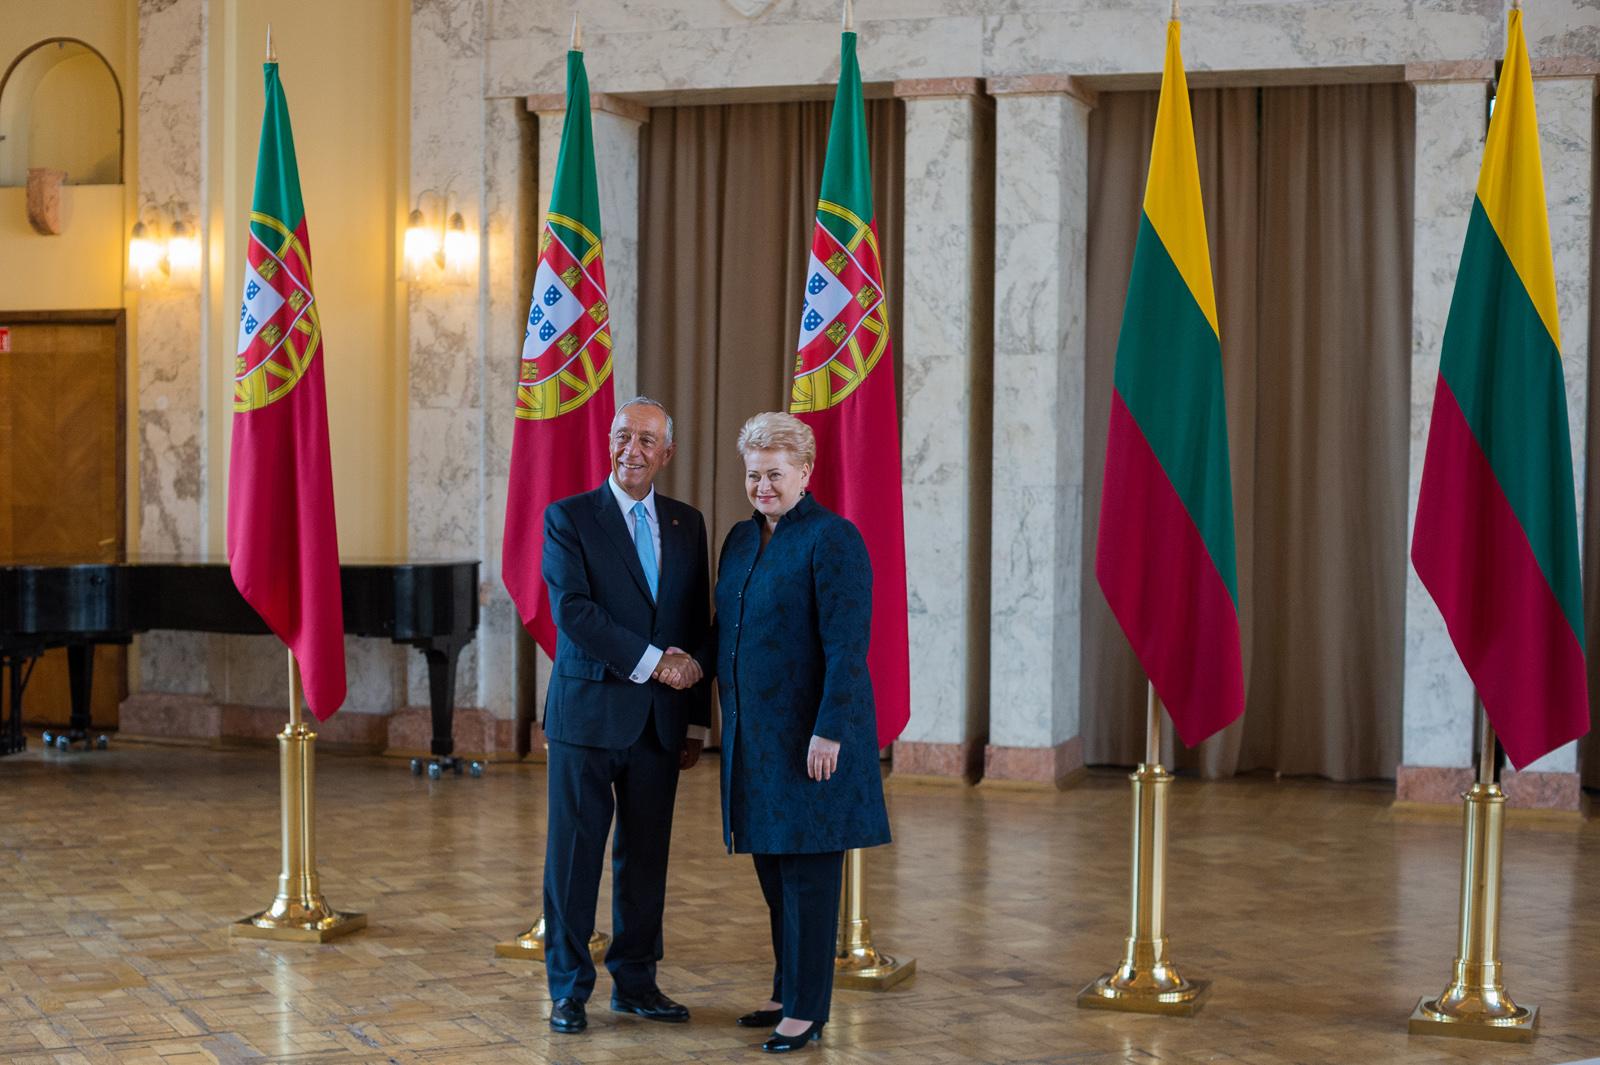 Prezidentė susitinka su Portugalijos Prezidentu Mercelo Rebelo de Sousa   lrp.lt nuotr.